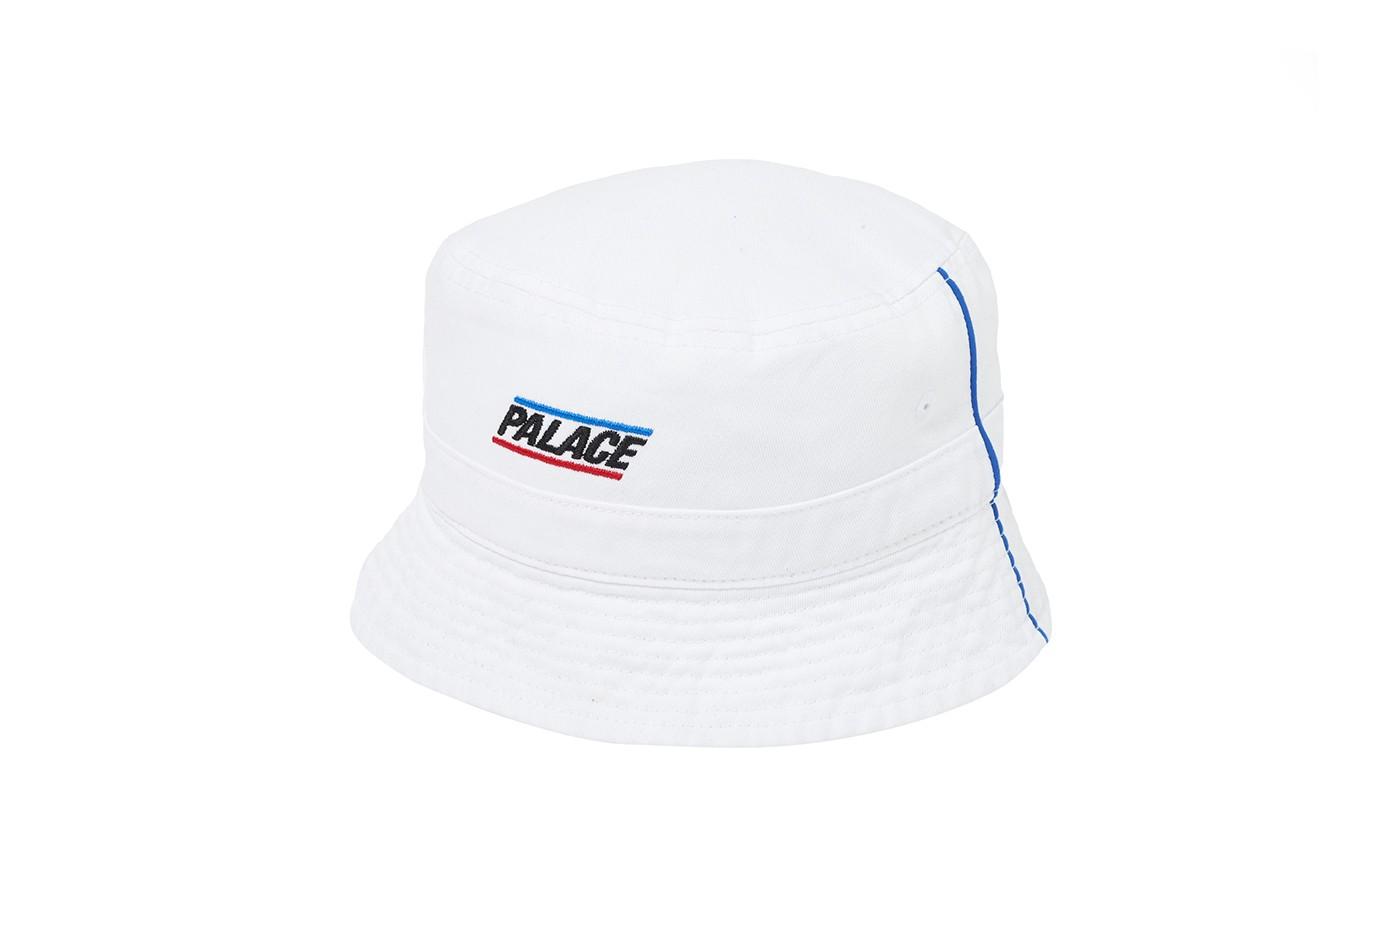 Palace Hat Summer 2020